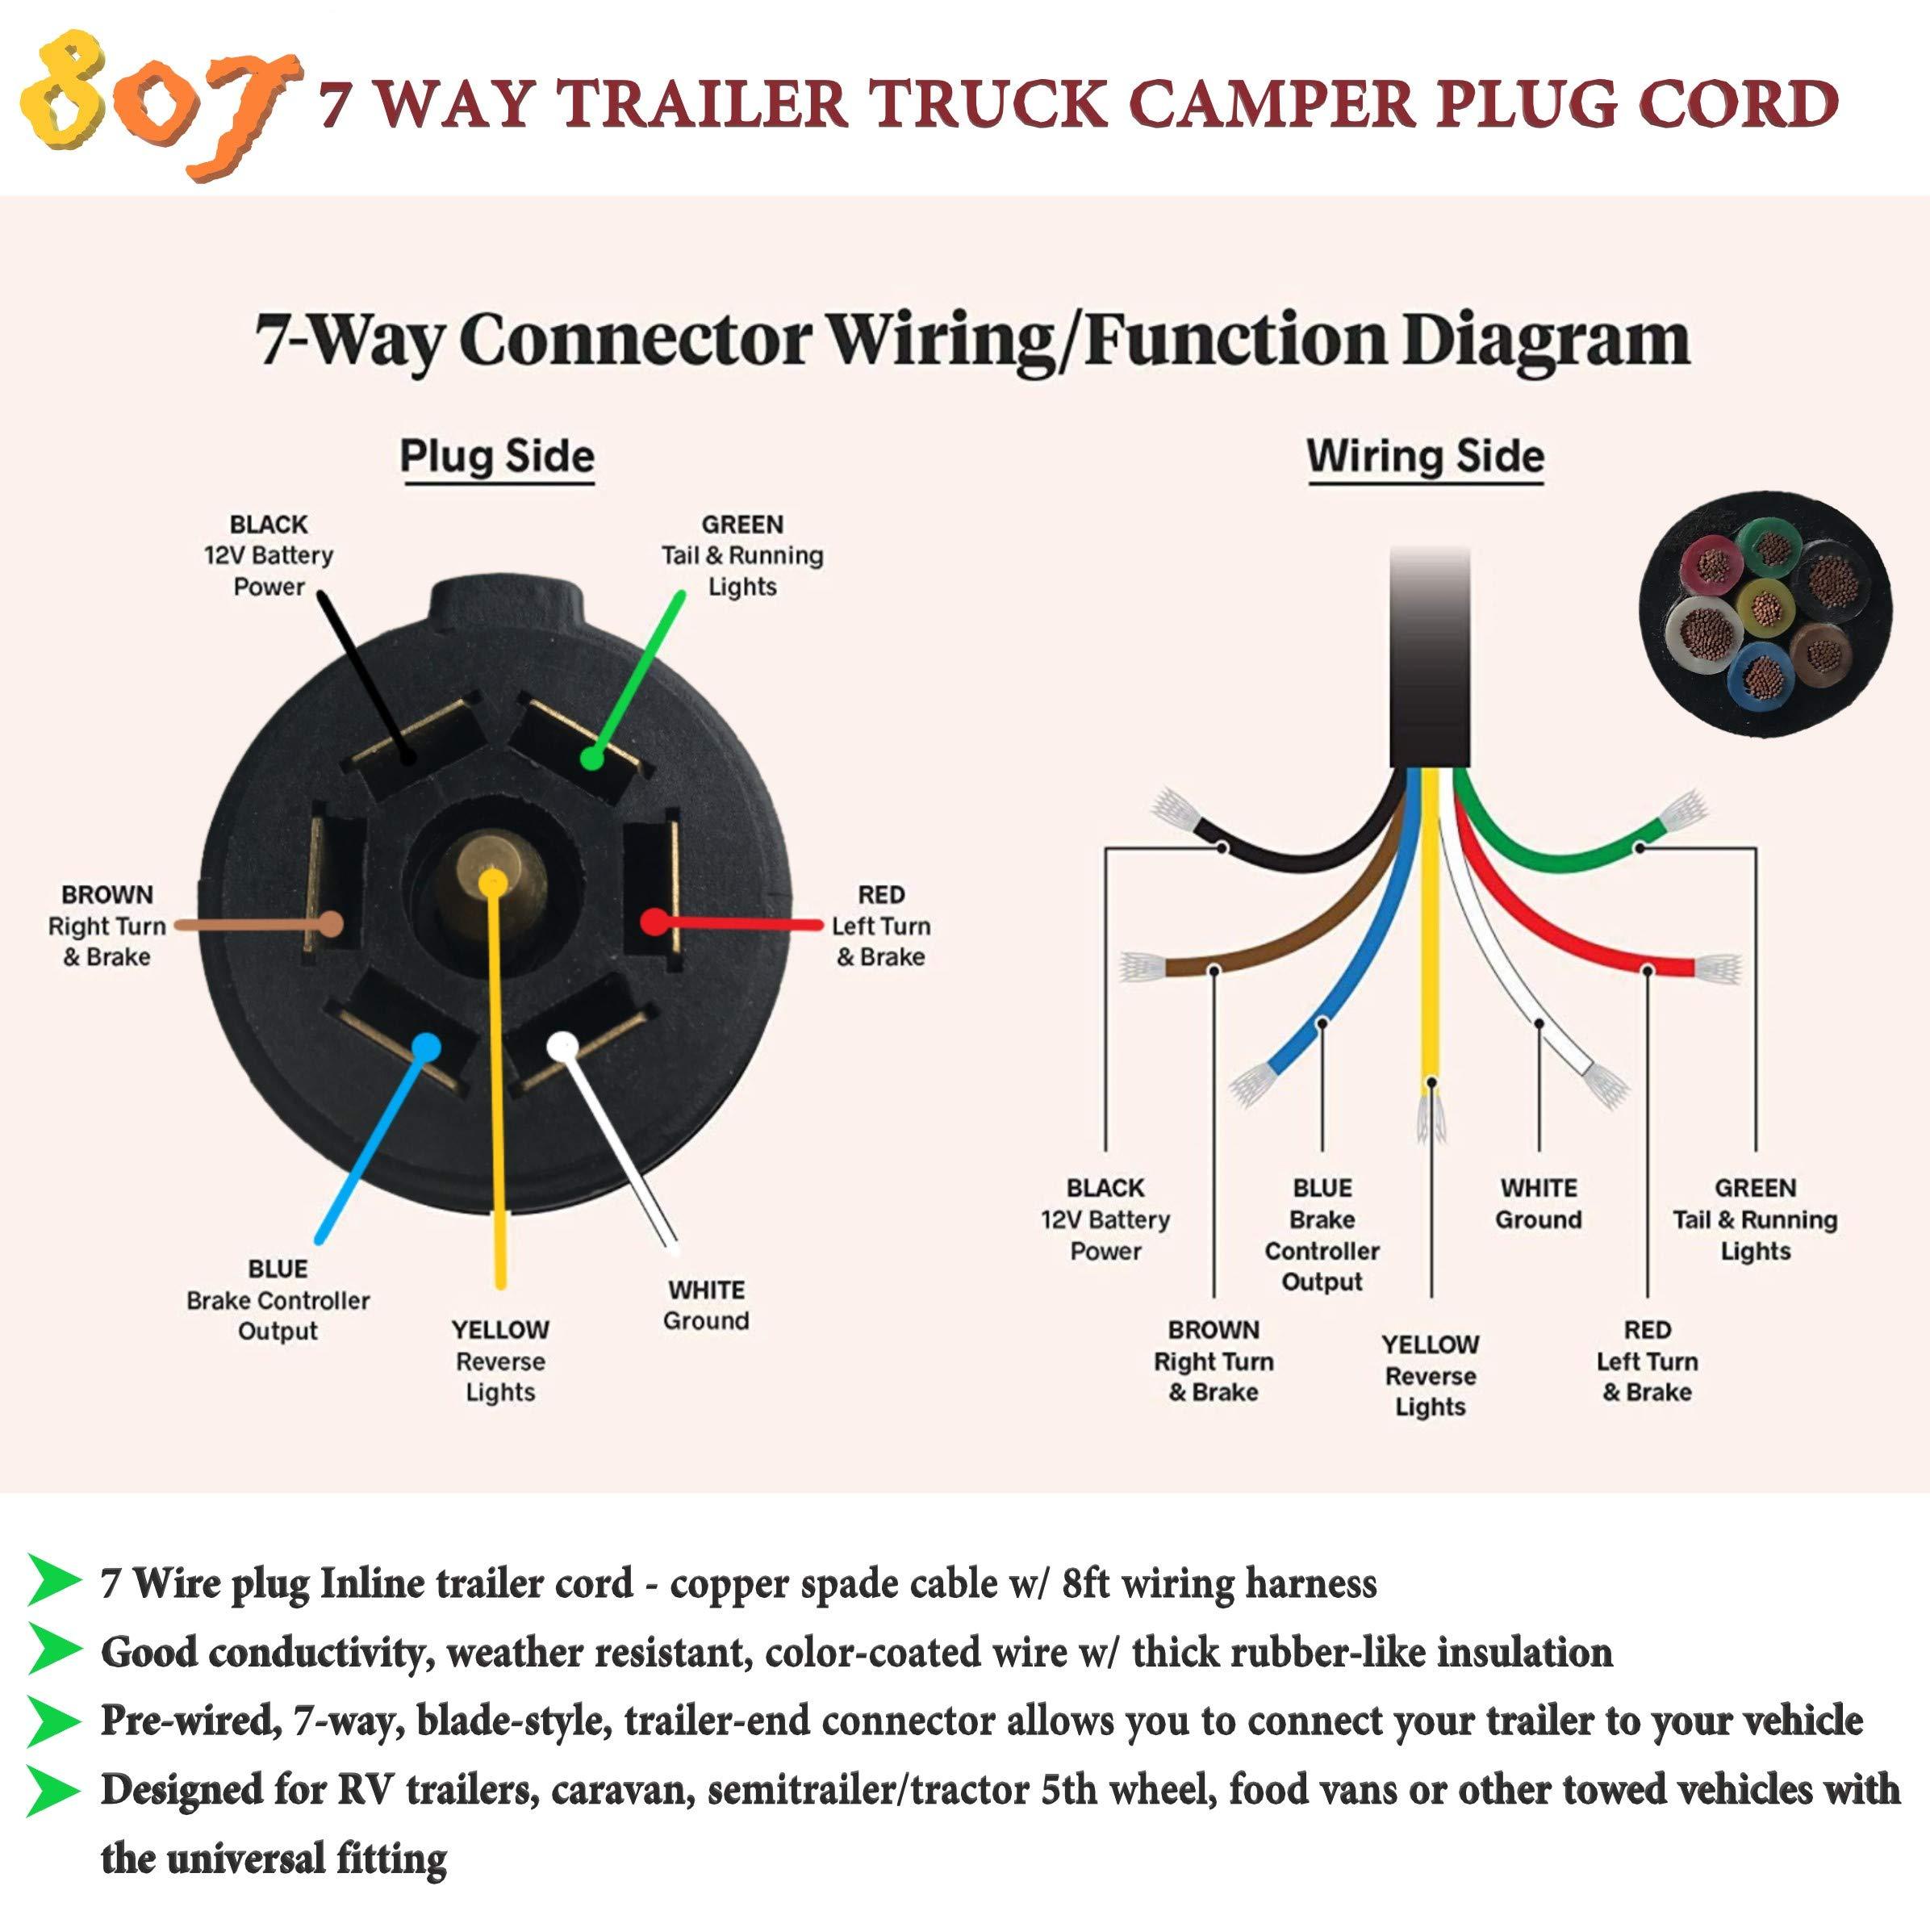 truck camper tail lights wiring diagram - subaru obd2 to obd1 wiring -  srd04actuator.yenpancane.jeanjaures37.fr  wiring diagram resource